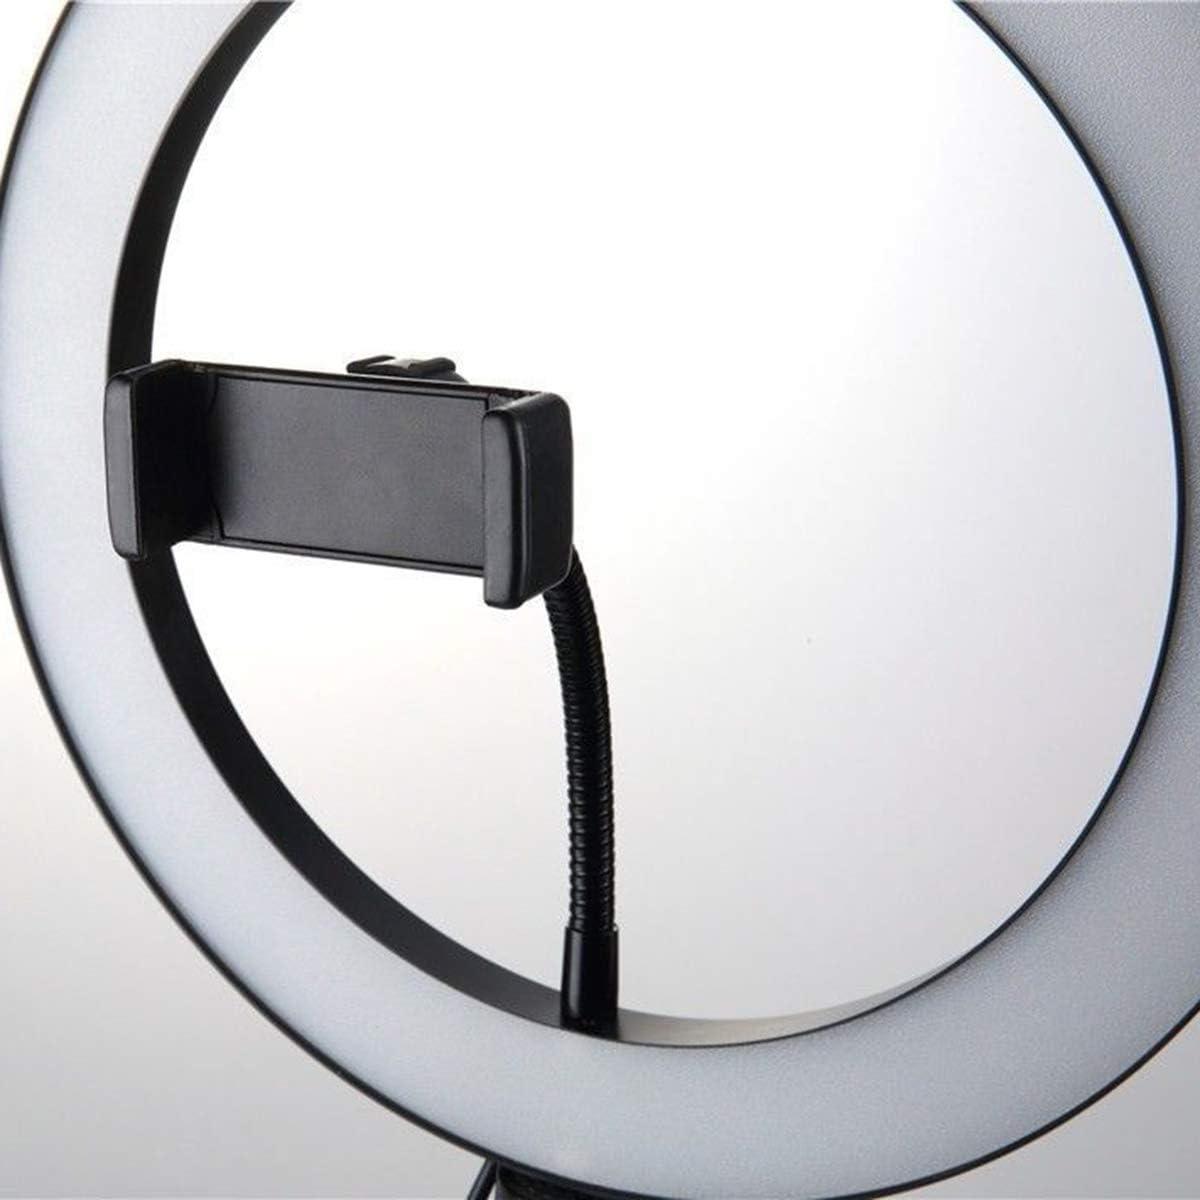 Fealay 26cm Studio Live Led Ring Light with Phone Holder 120cm Ring Light Kit Foldable Tripod Kit Adjustable 360 Rotation for Phone Selfie Light Beauty Photograph